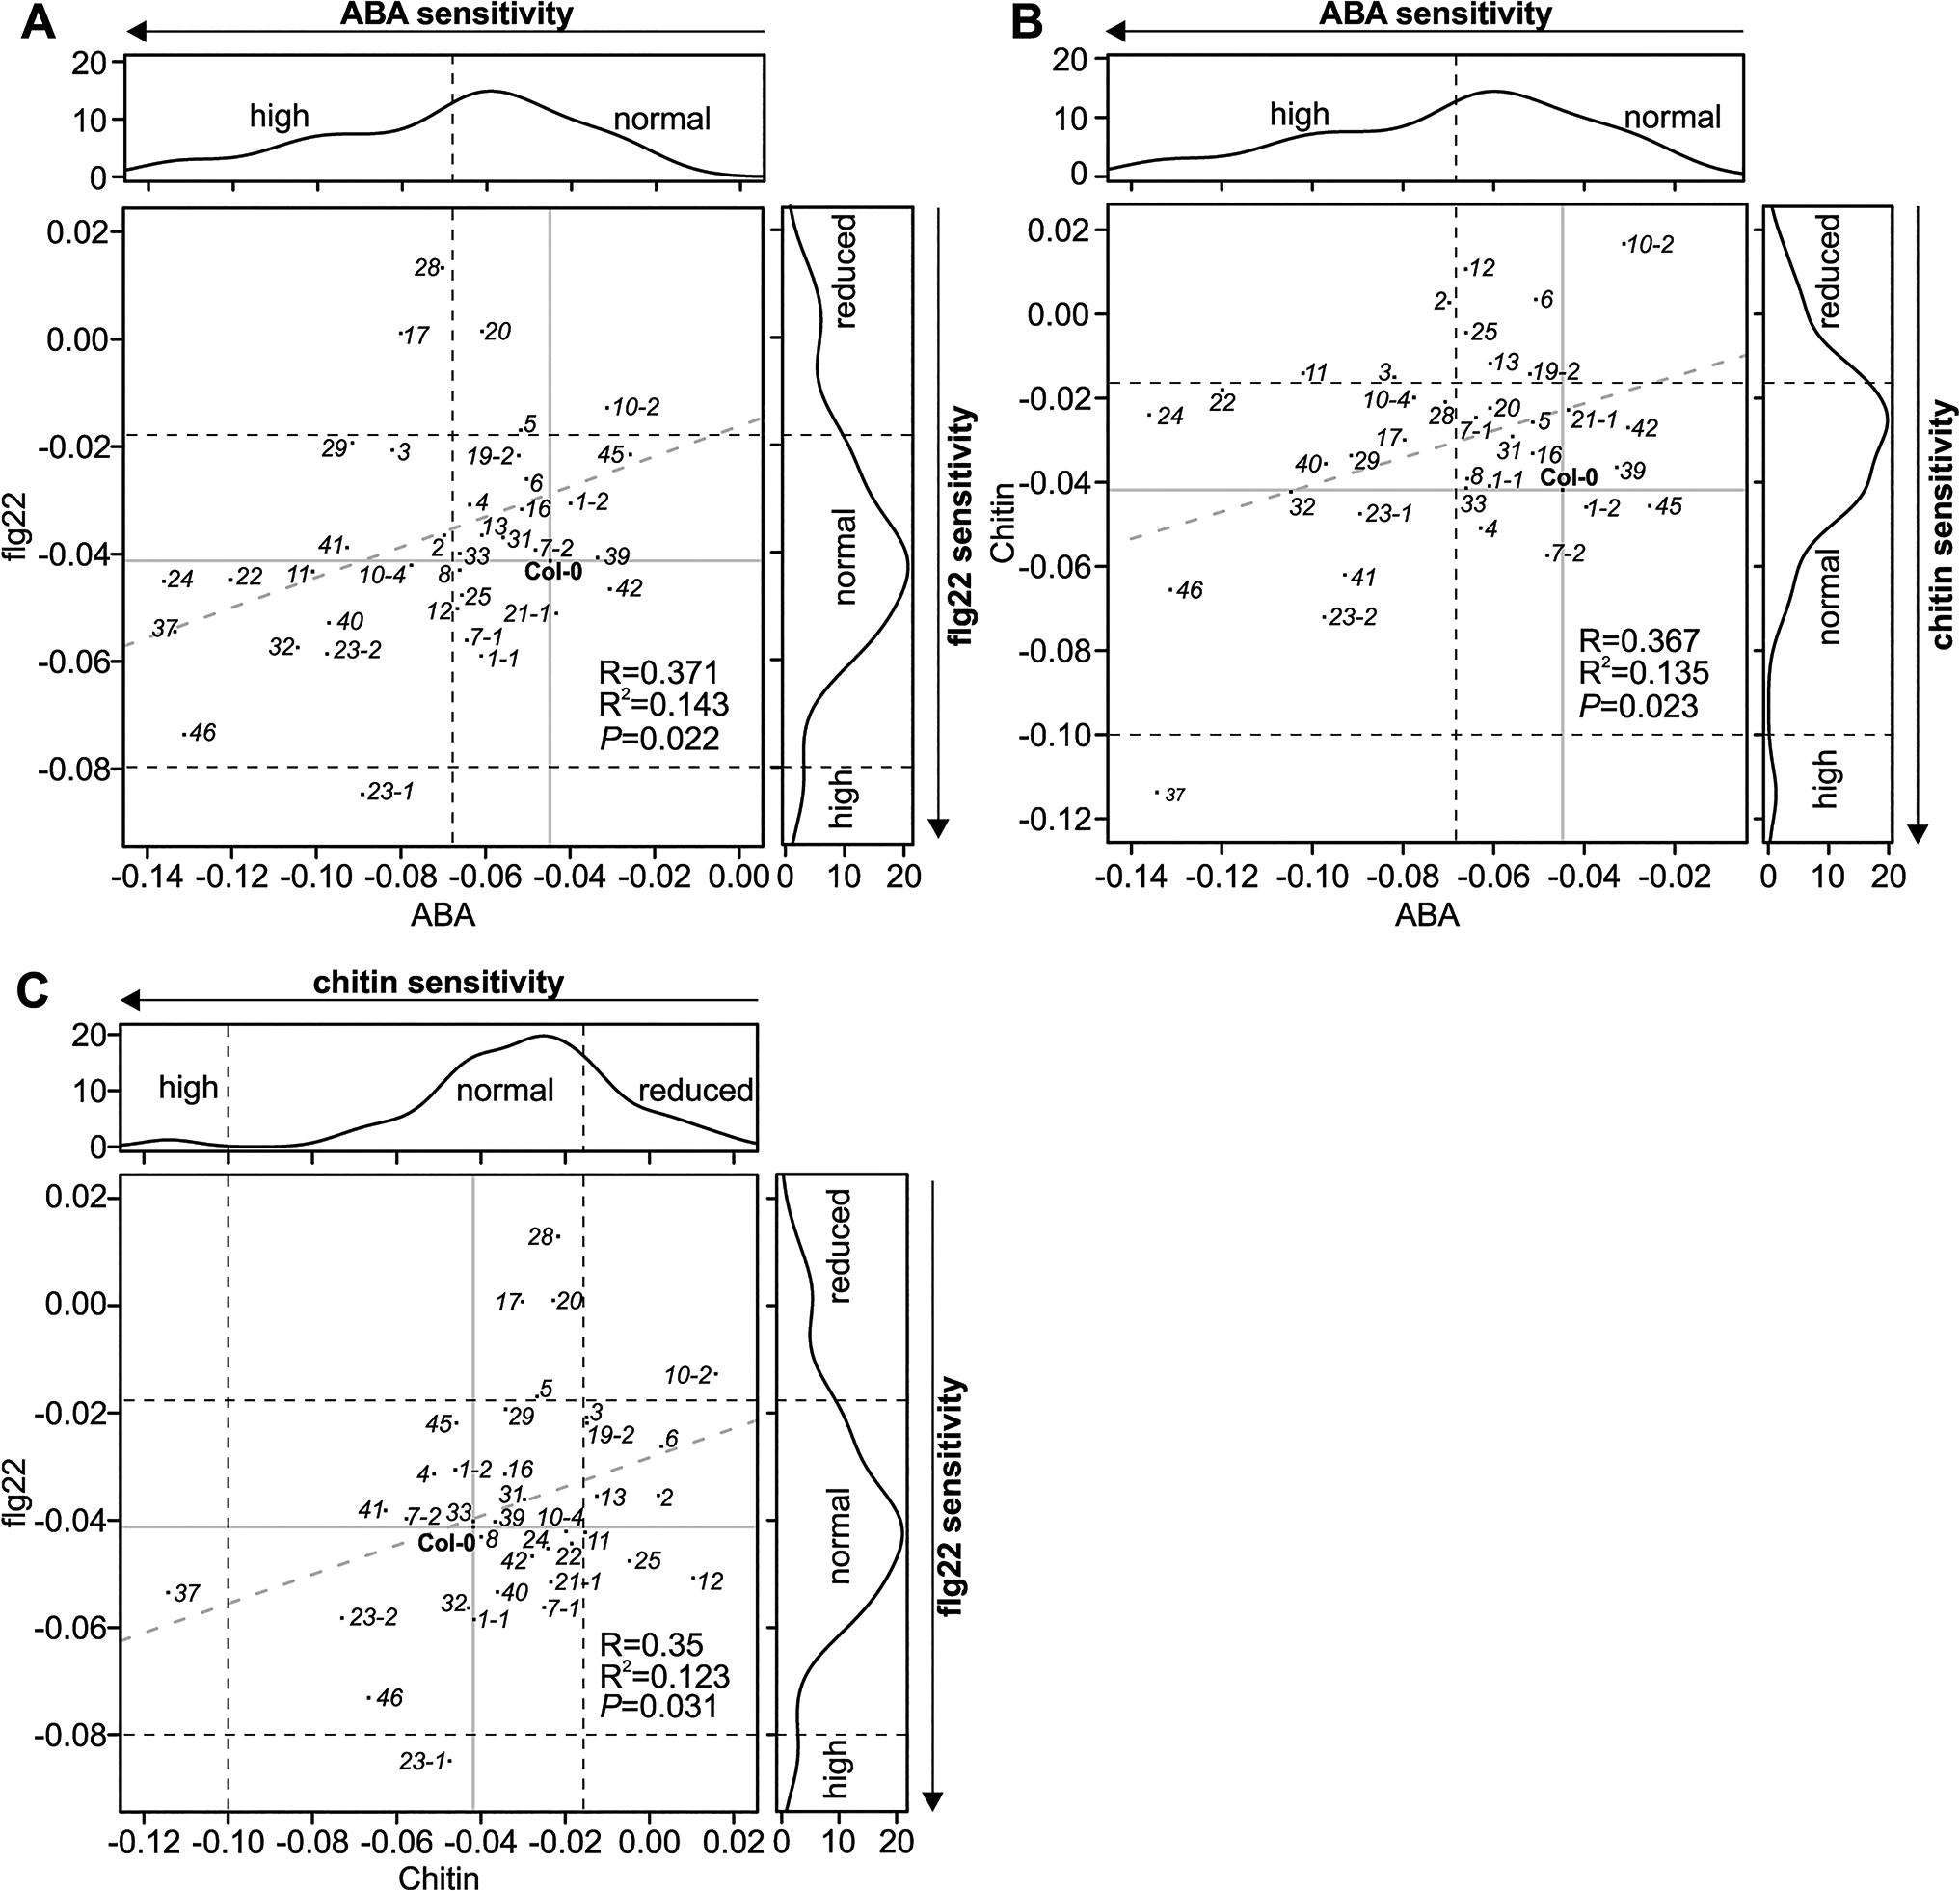 Scatter plots for stomatal regulation in <i>crk</i> mutants.